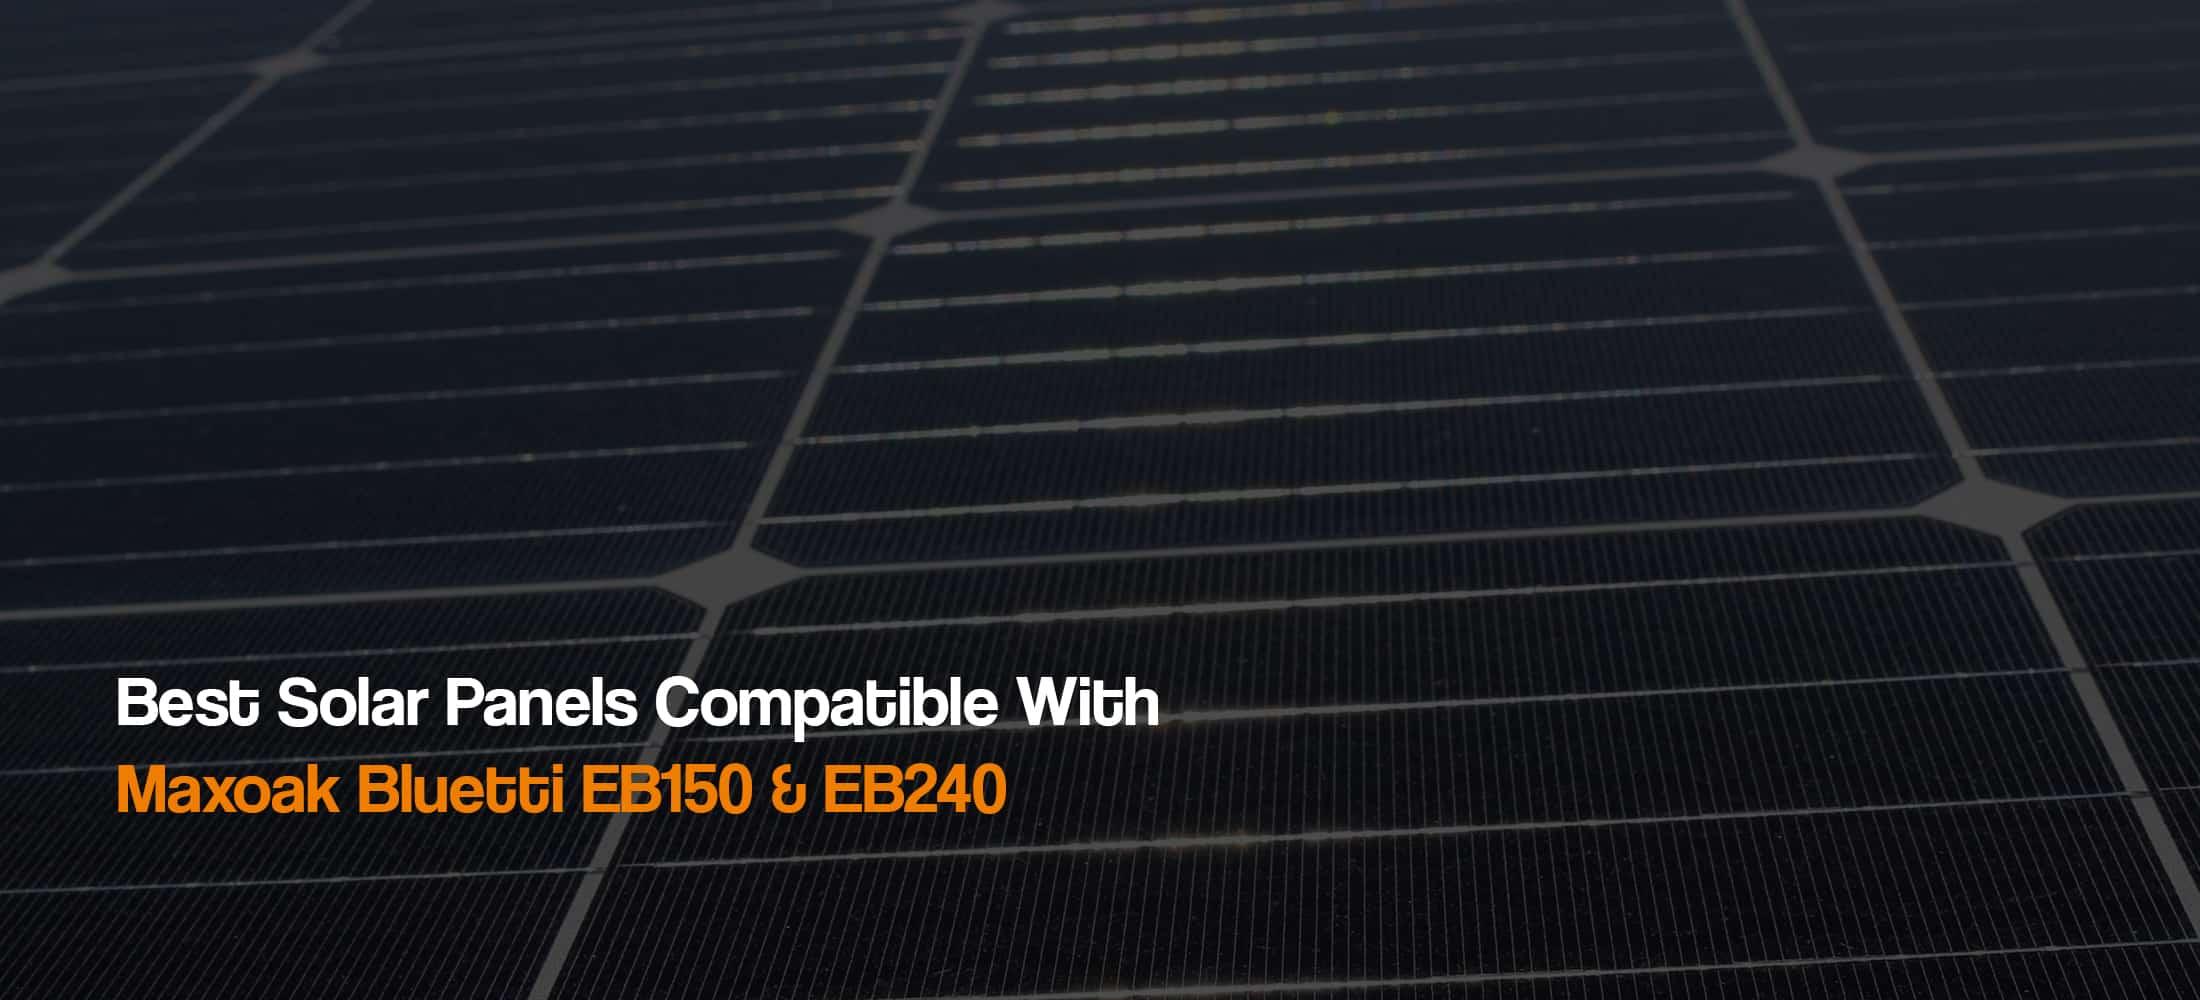 best-solar-panels-compatible-with-maxoak-bluetti-eb150-eb240-power-station-solar-generator-the-solar-addict